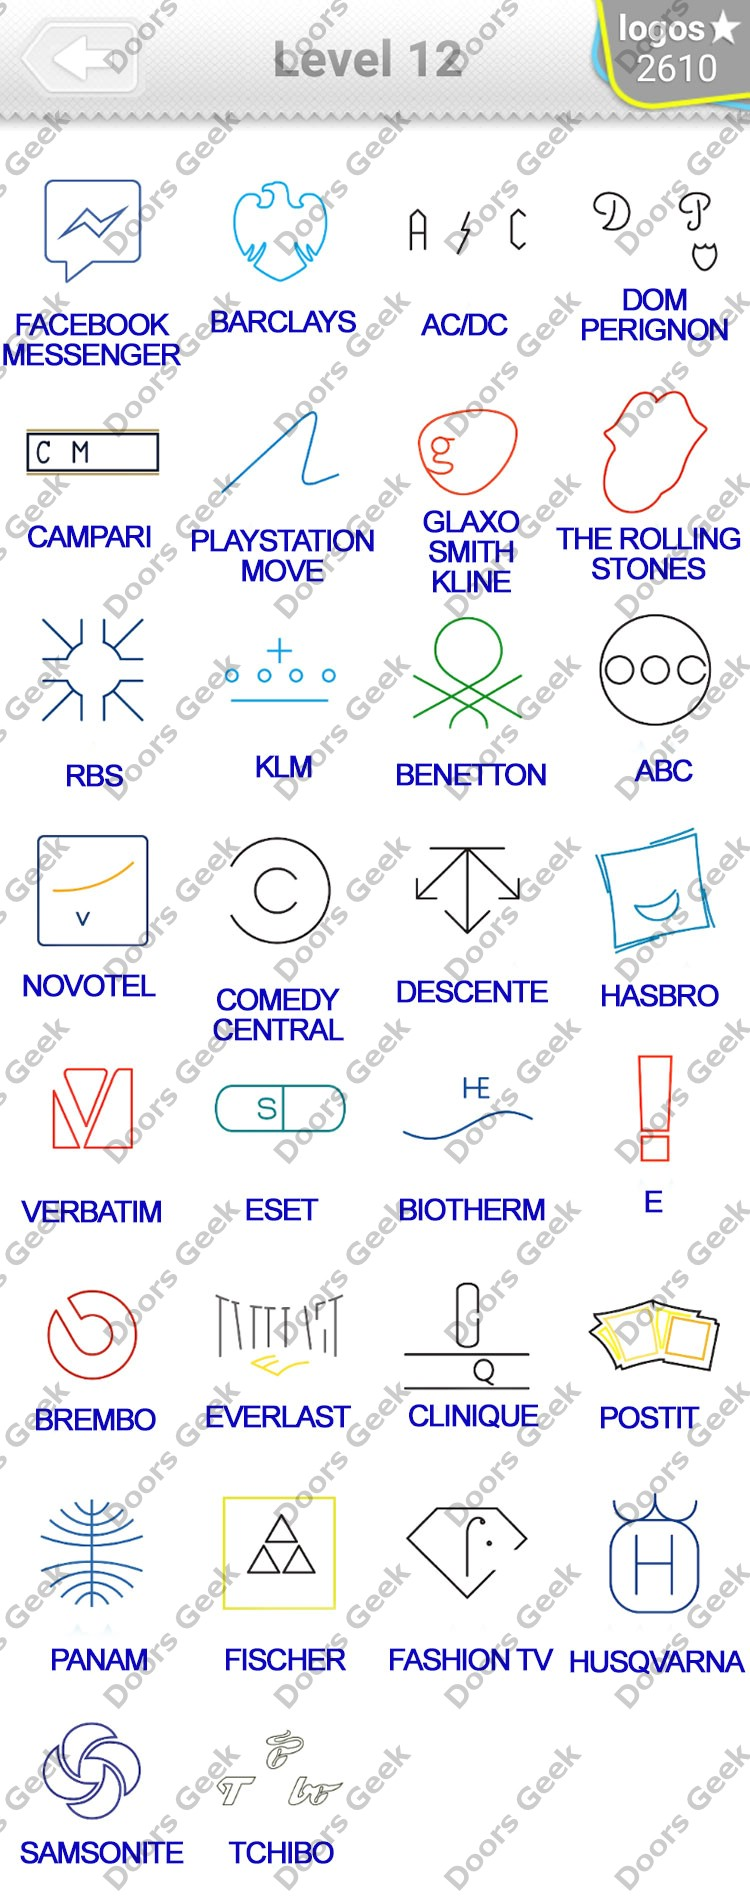 logo quiz minimalist niveau 9